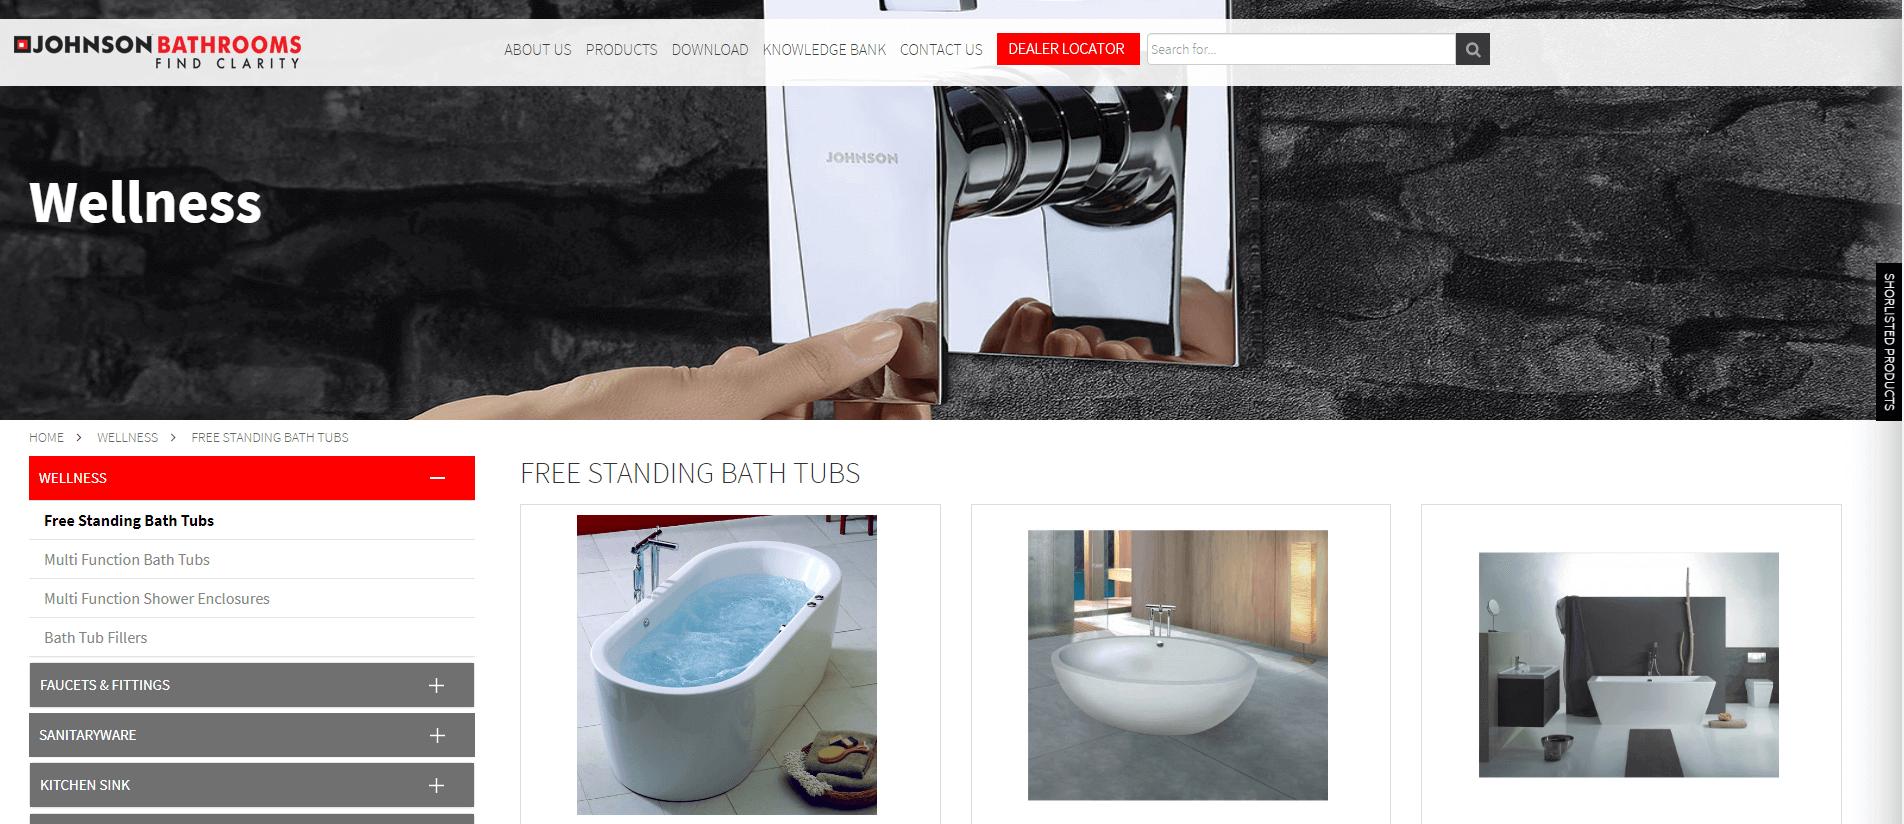 Johnson Bathrooms Bathtub Manufacturer